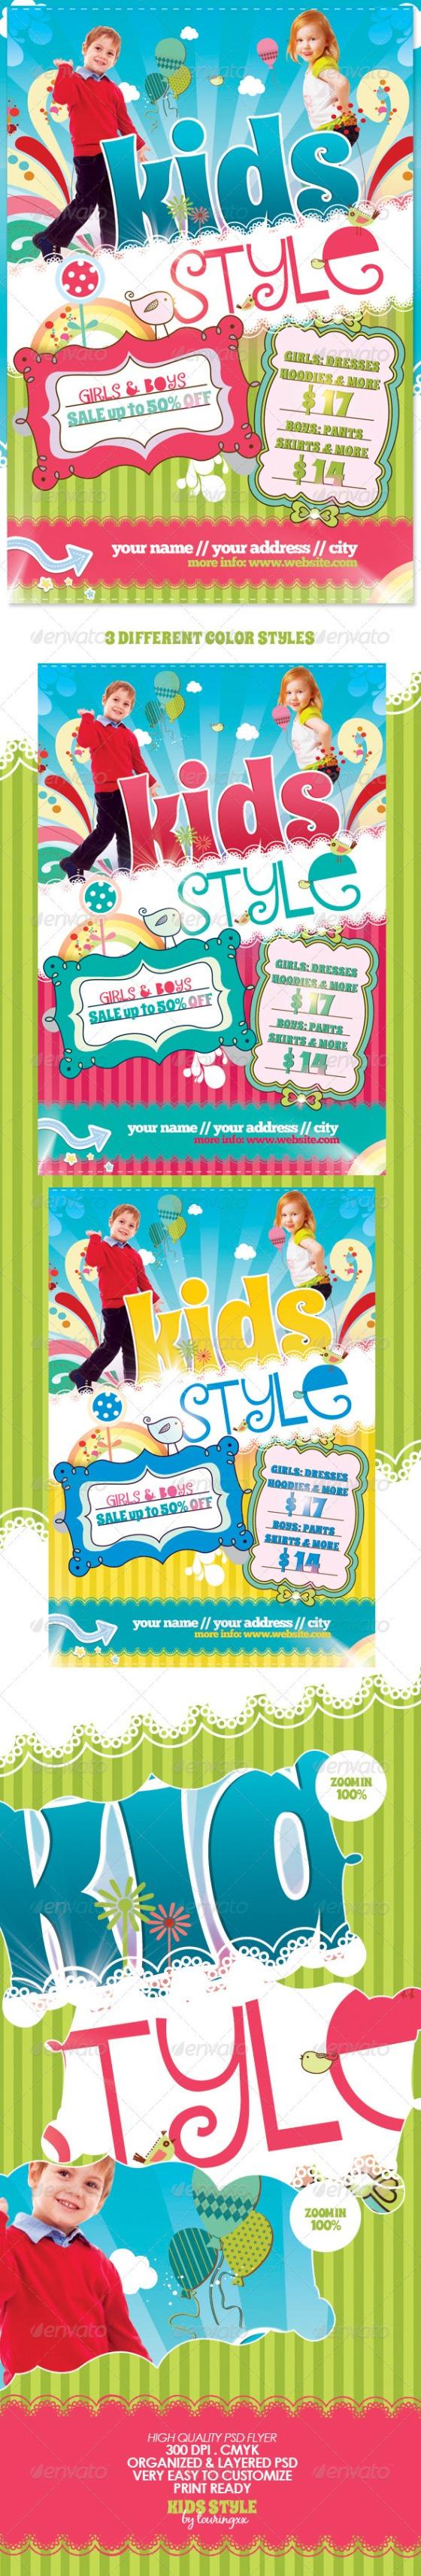 Kids style flyer